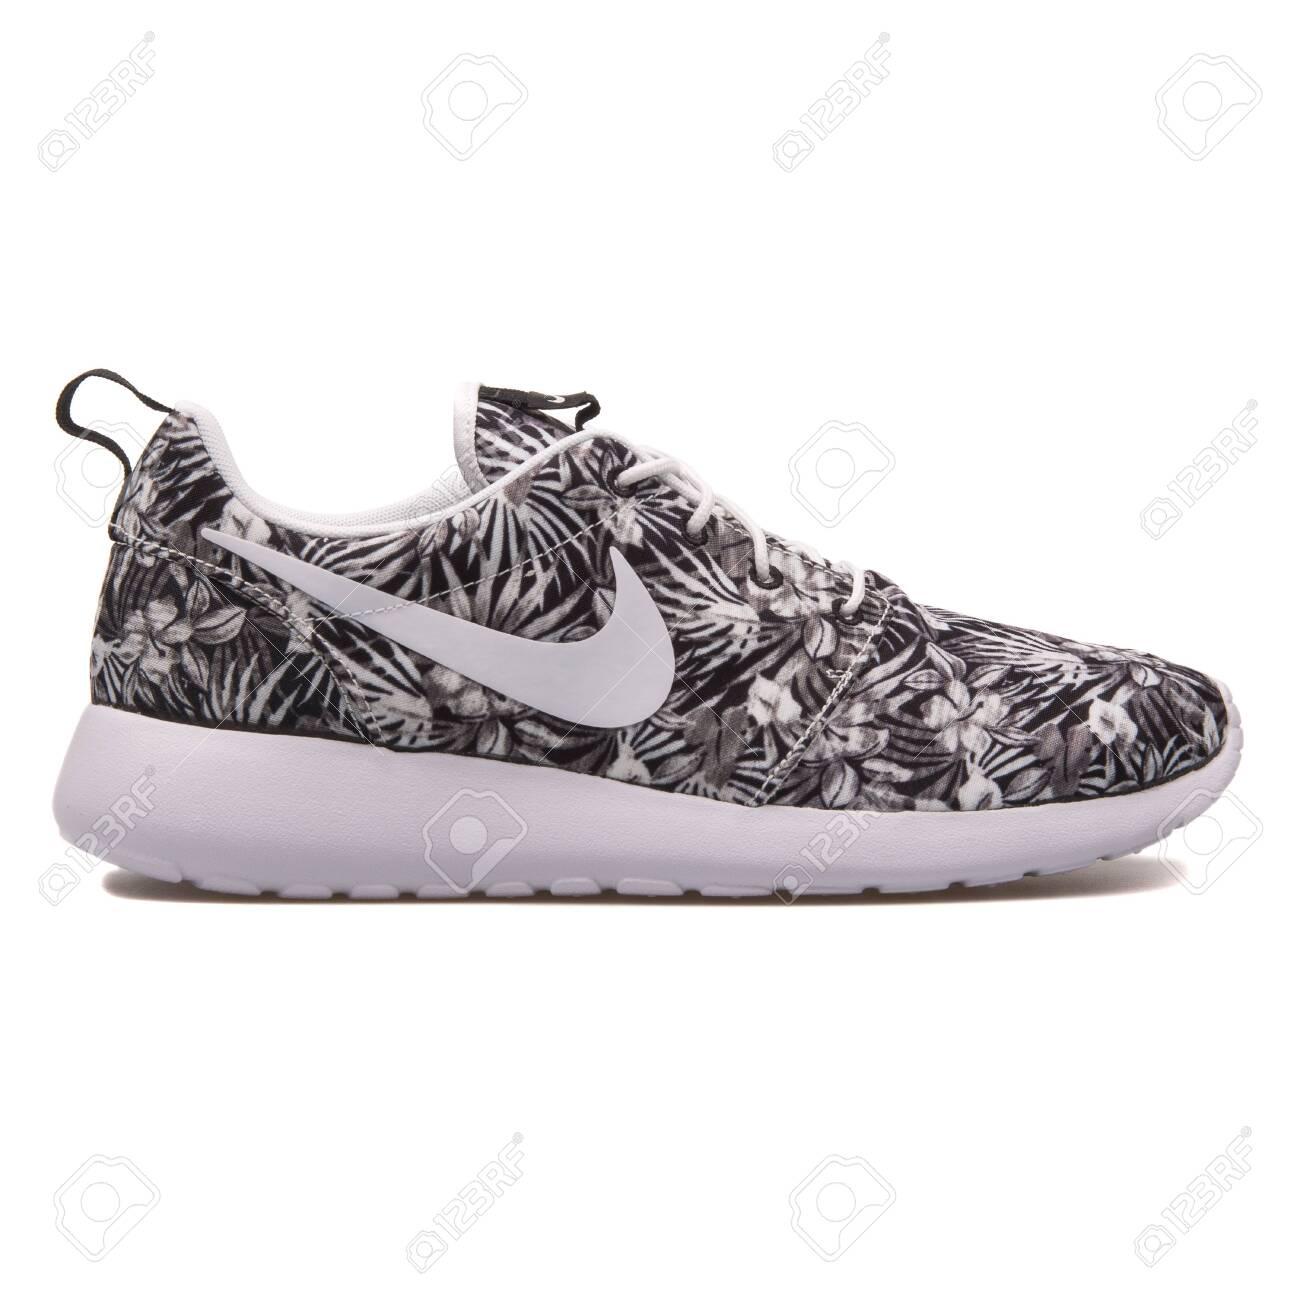 Nike Roshe One Print Premium.. Stock